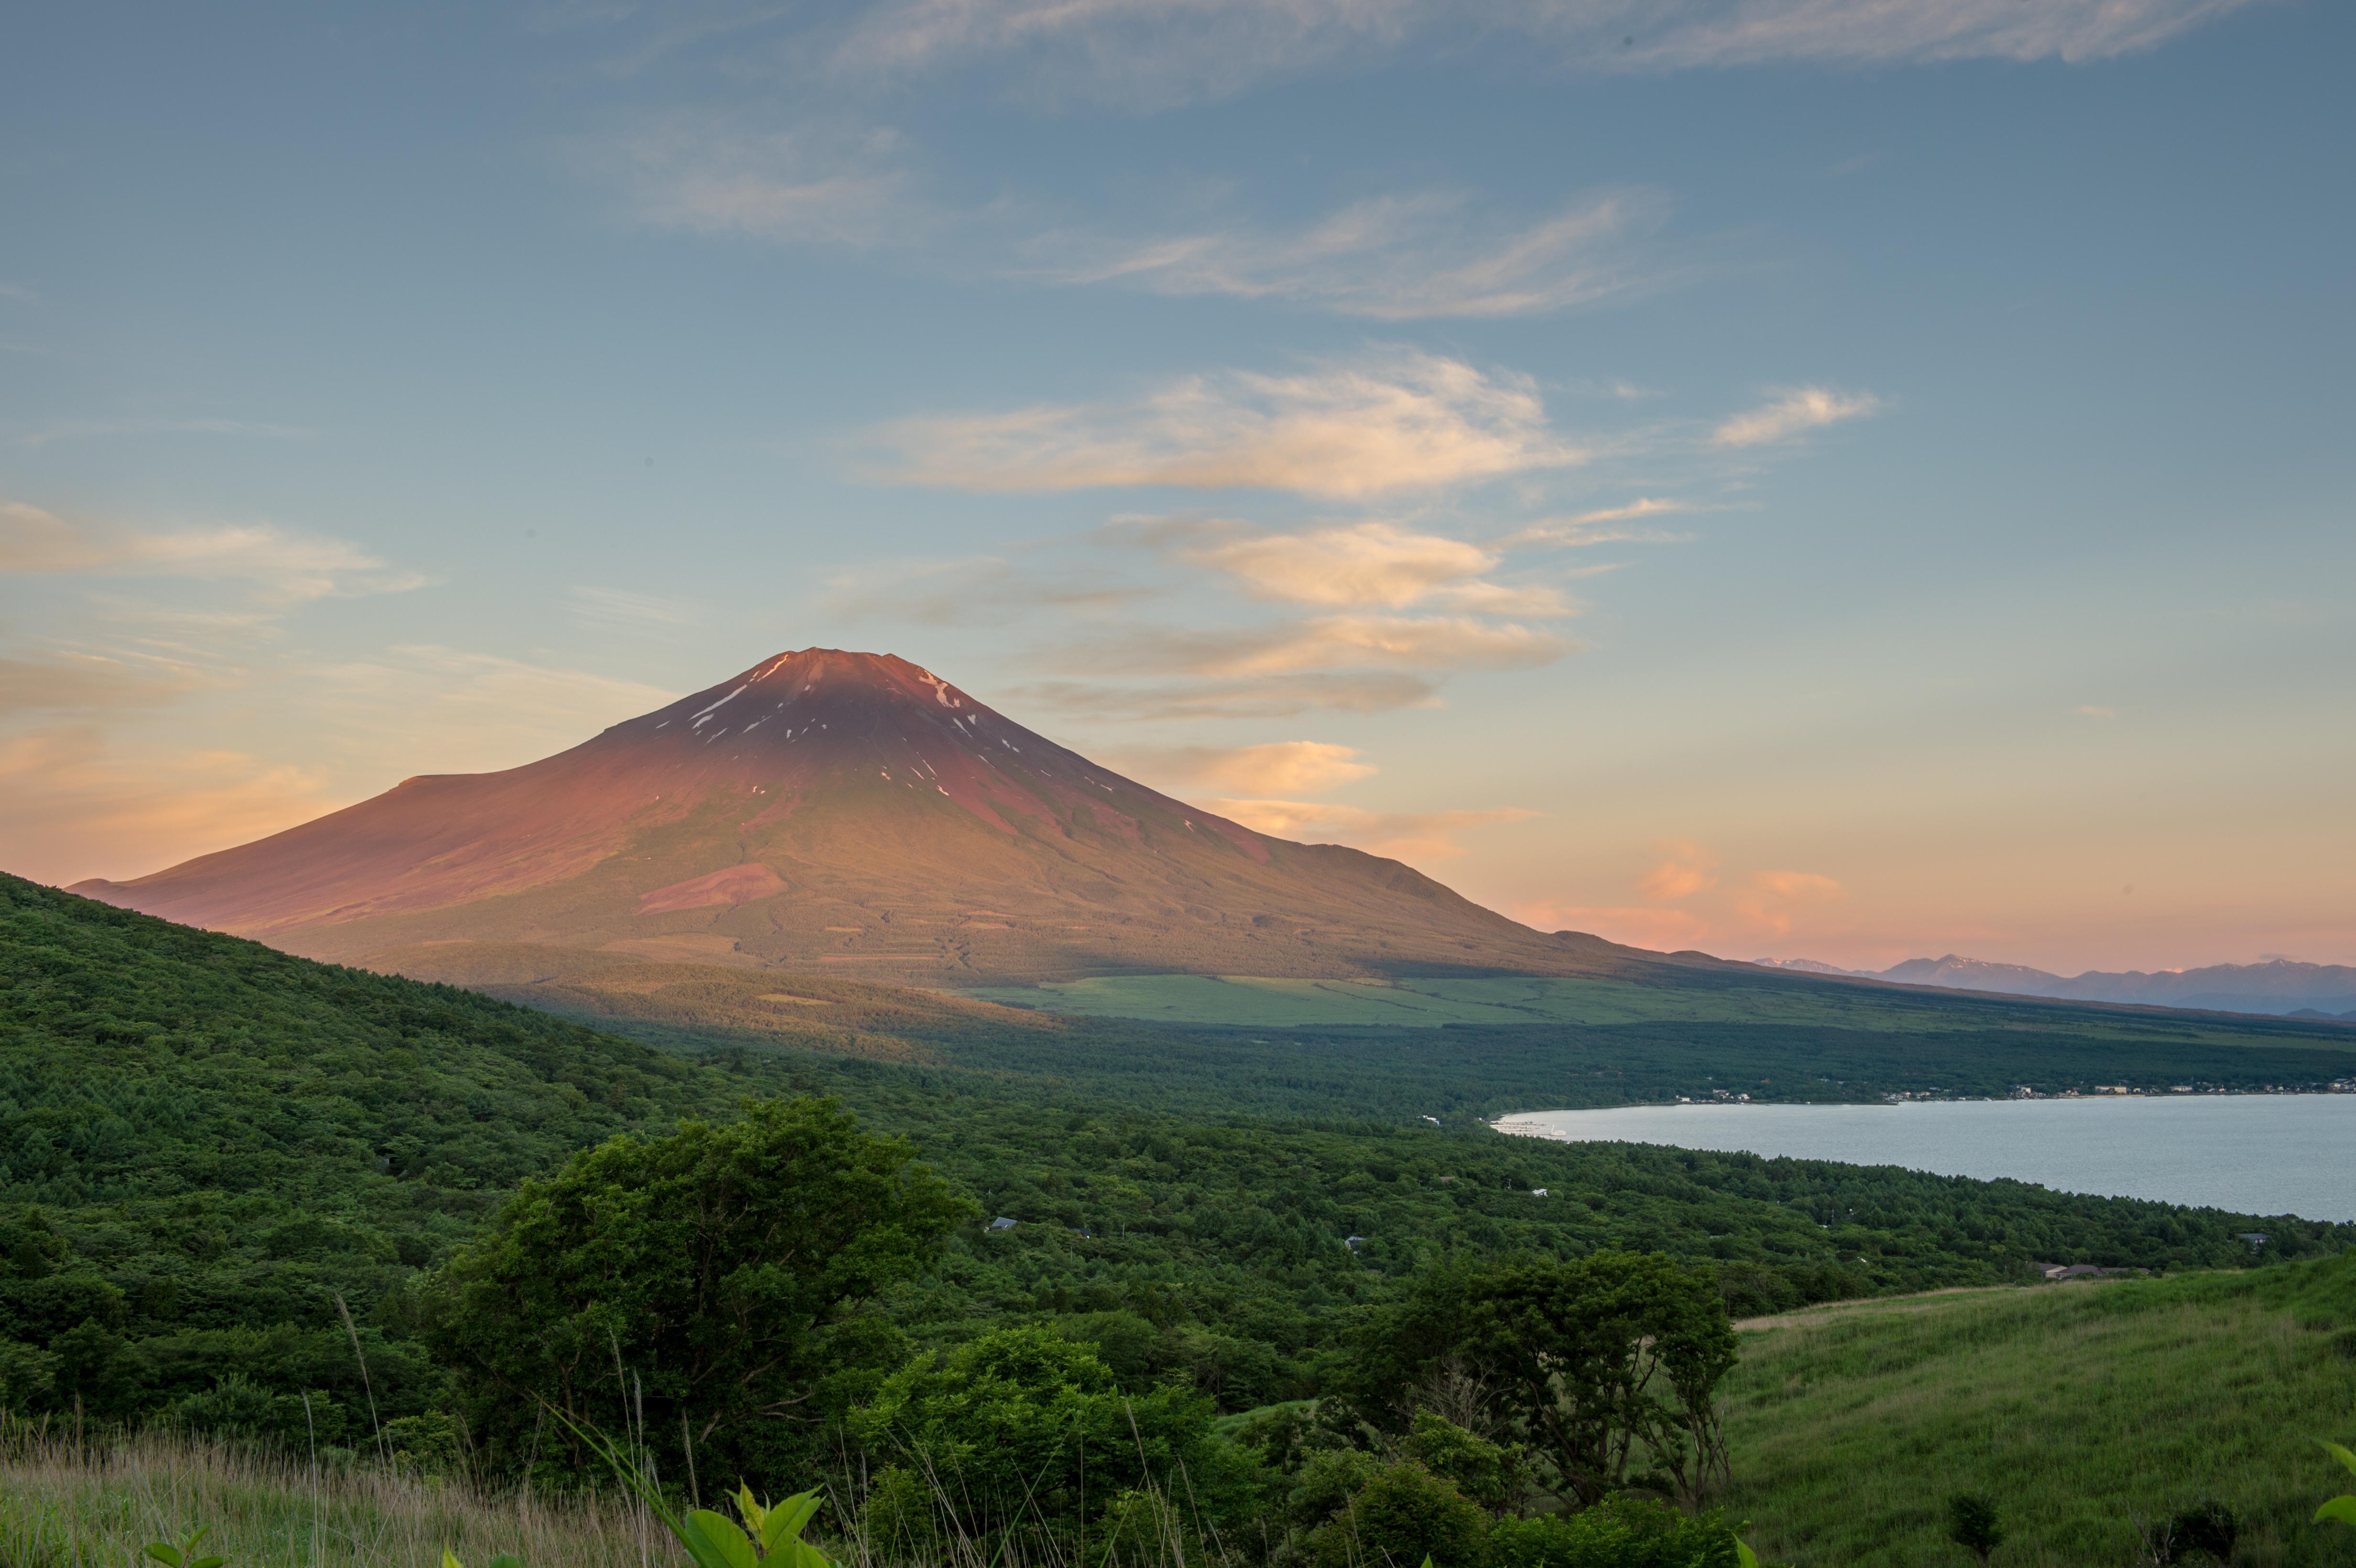 Mount Fuji 4k Ultra Hd Wallpaper Background Image